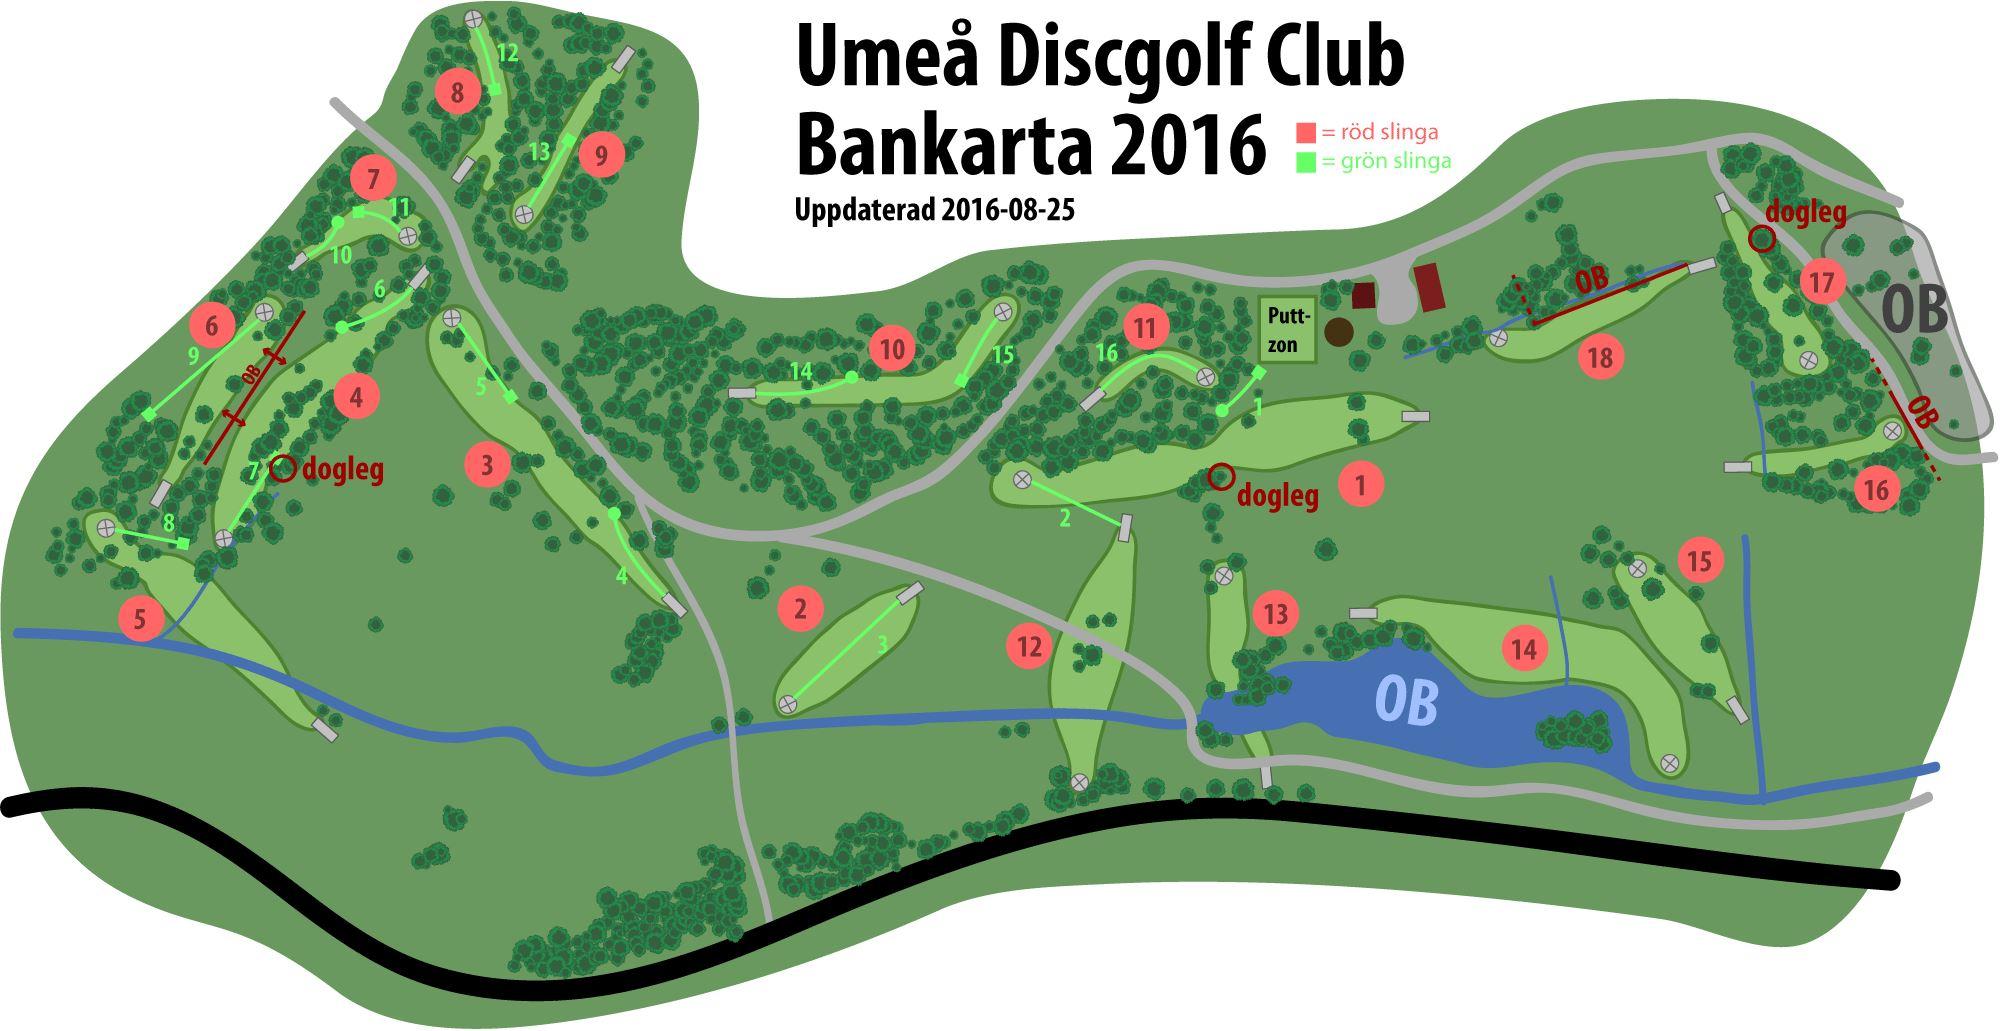 Play disc golf